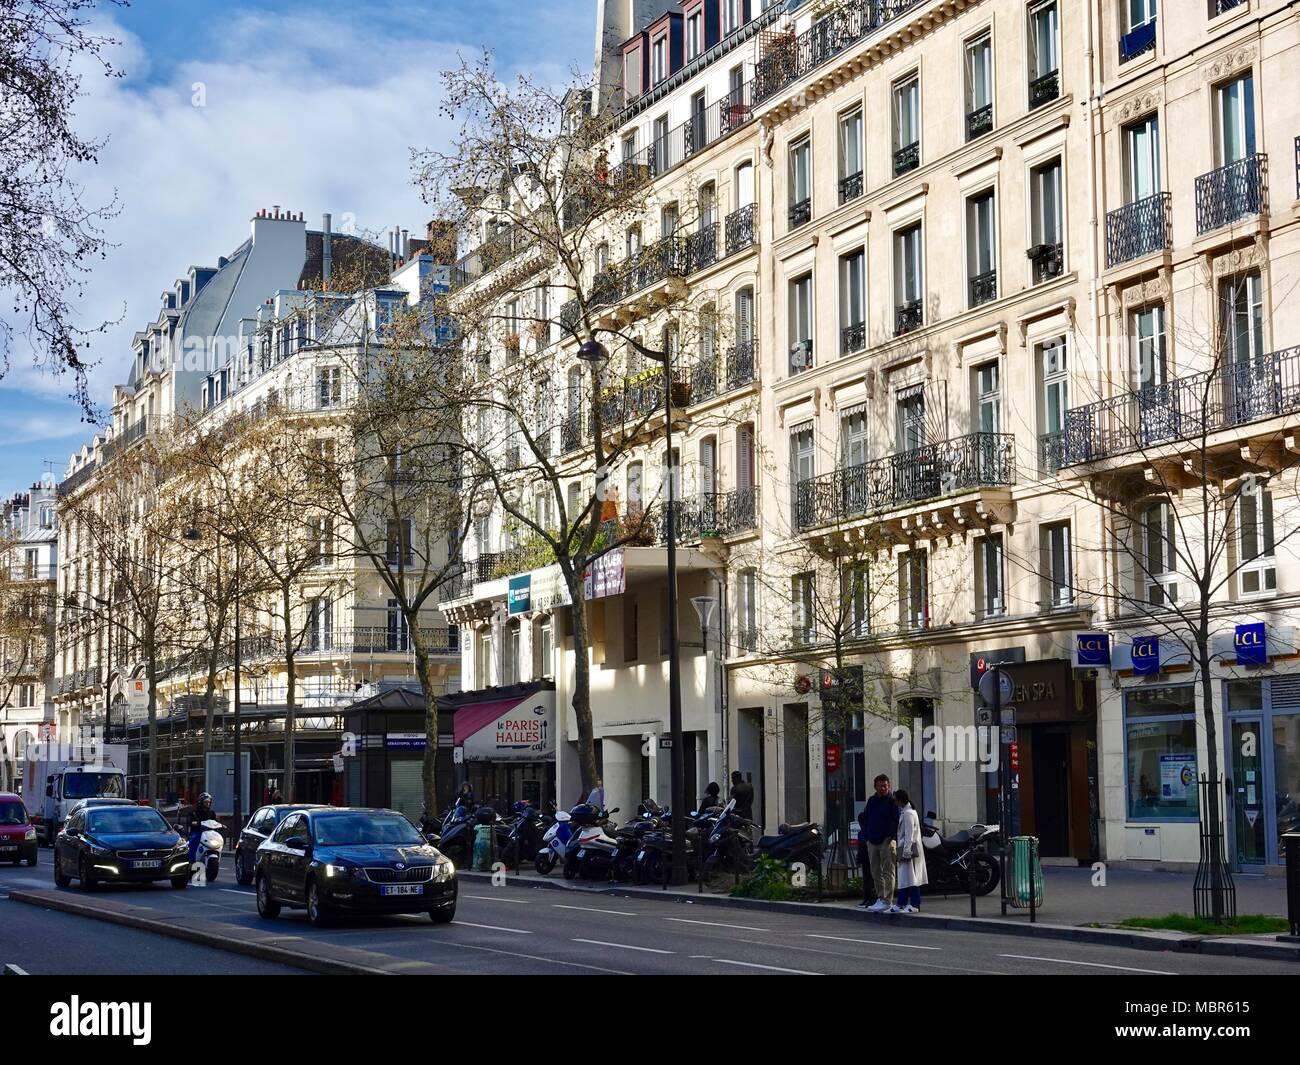 Morning traffic and pedestrians, buildings, on Boulevard de Sébastopol in the 1st Arrondissement of Paris, France. - Stock Image